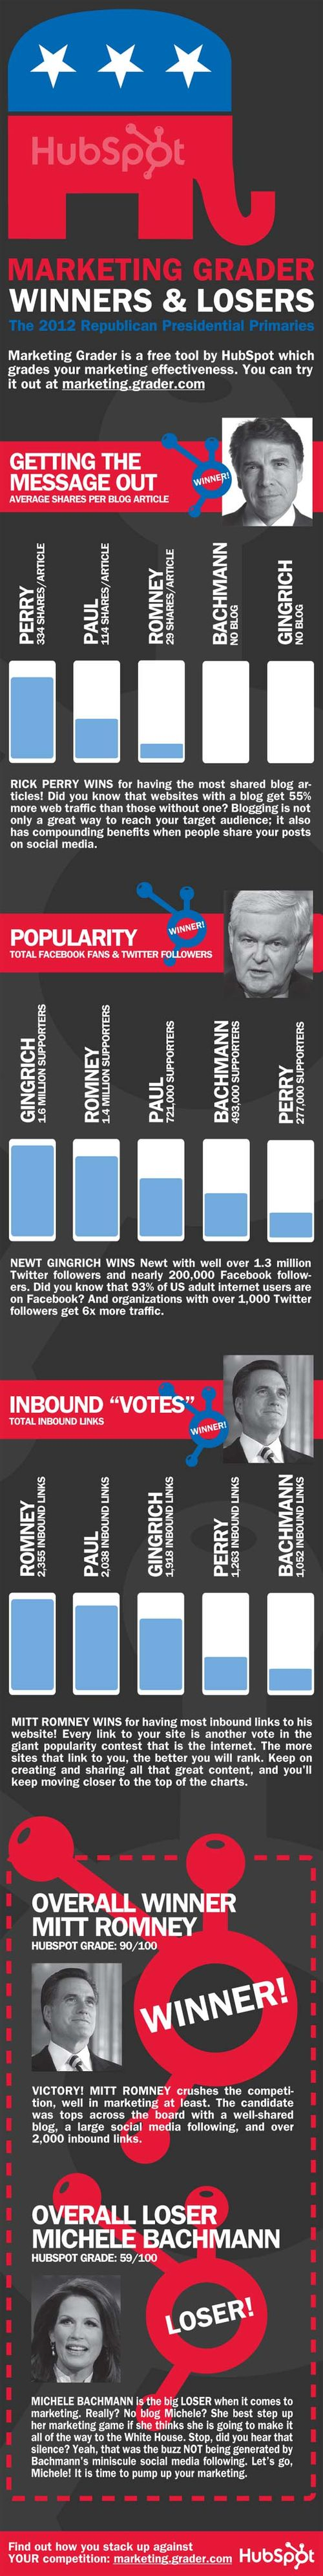 Republican infographic